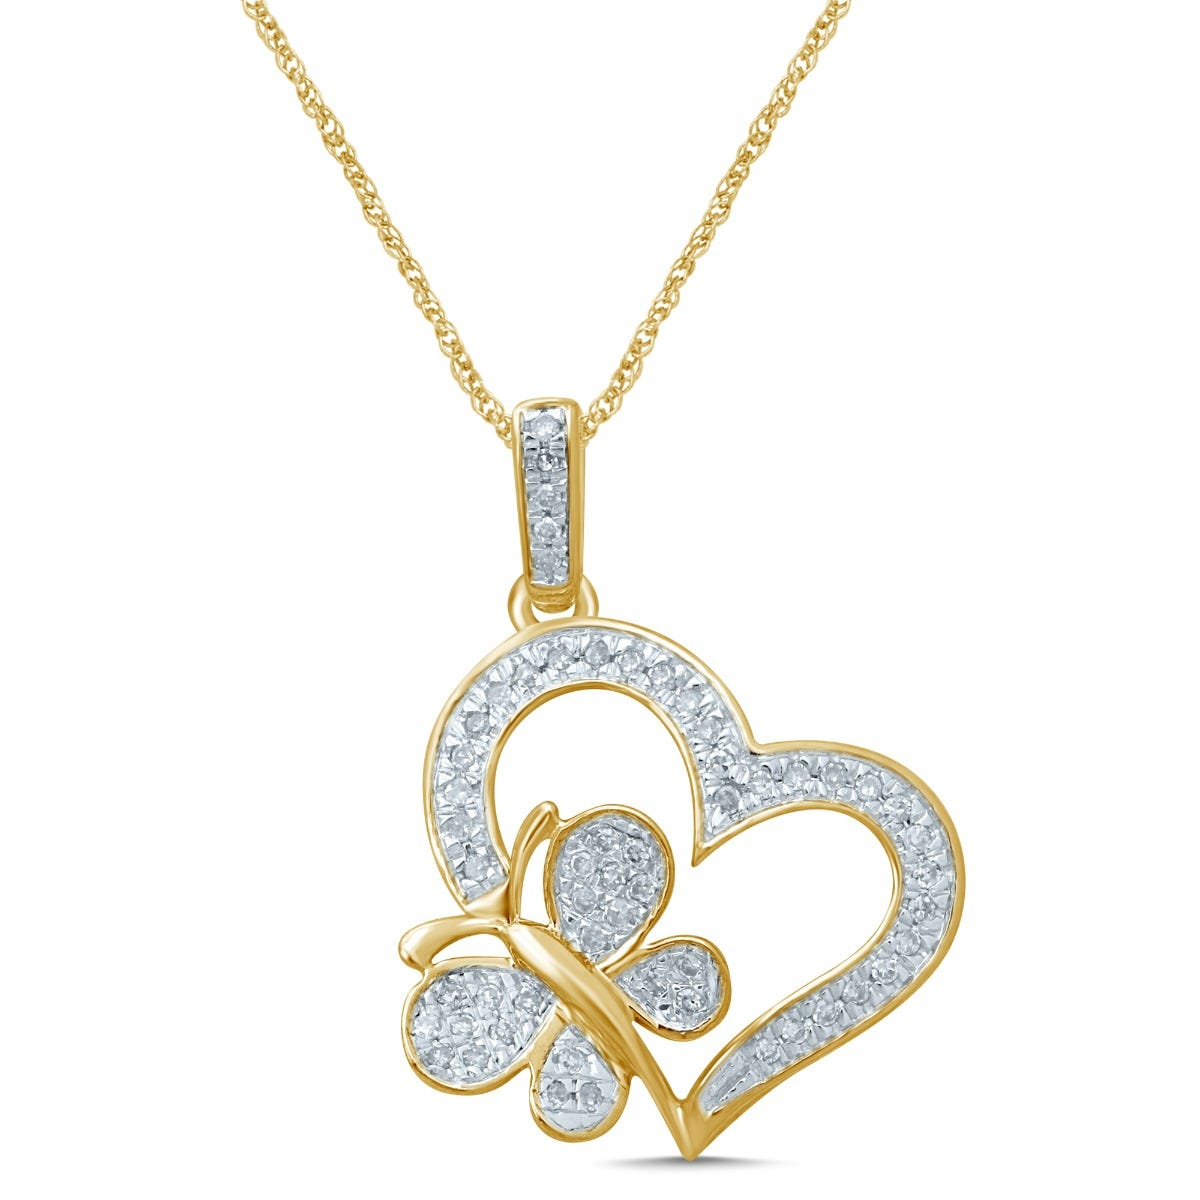 Diamond Butterfly in Heart Fashion Pendant in 10k Yellow Gold